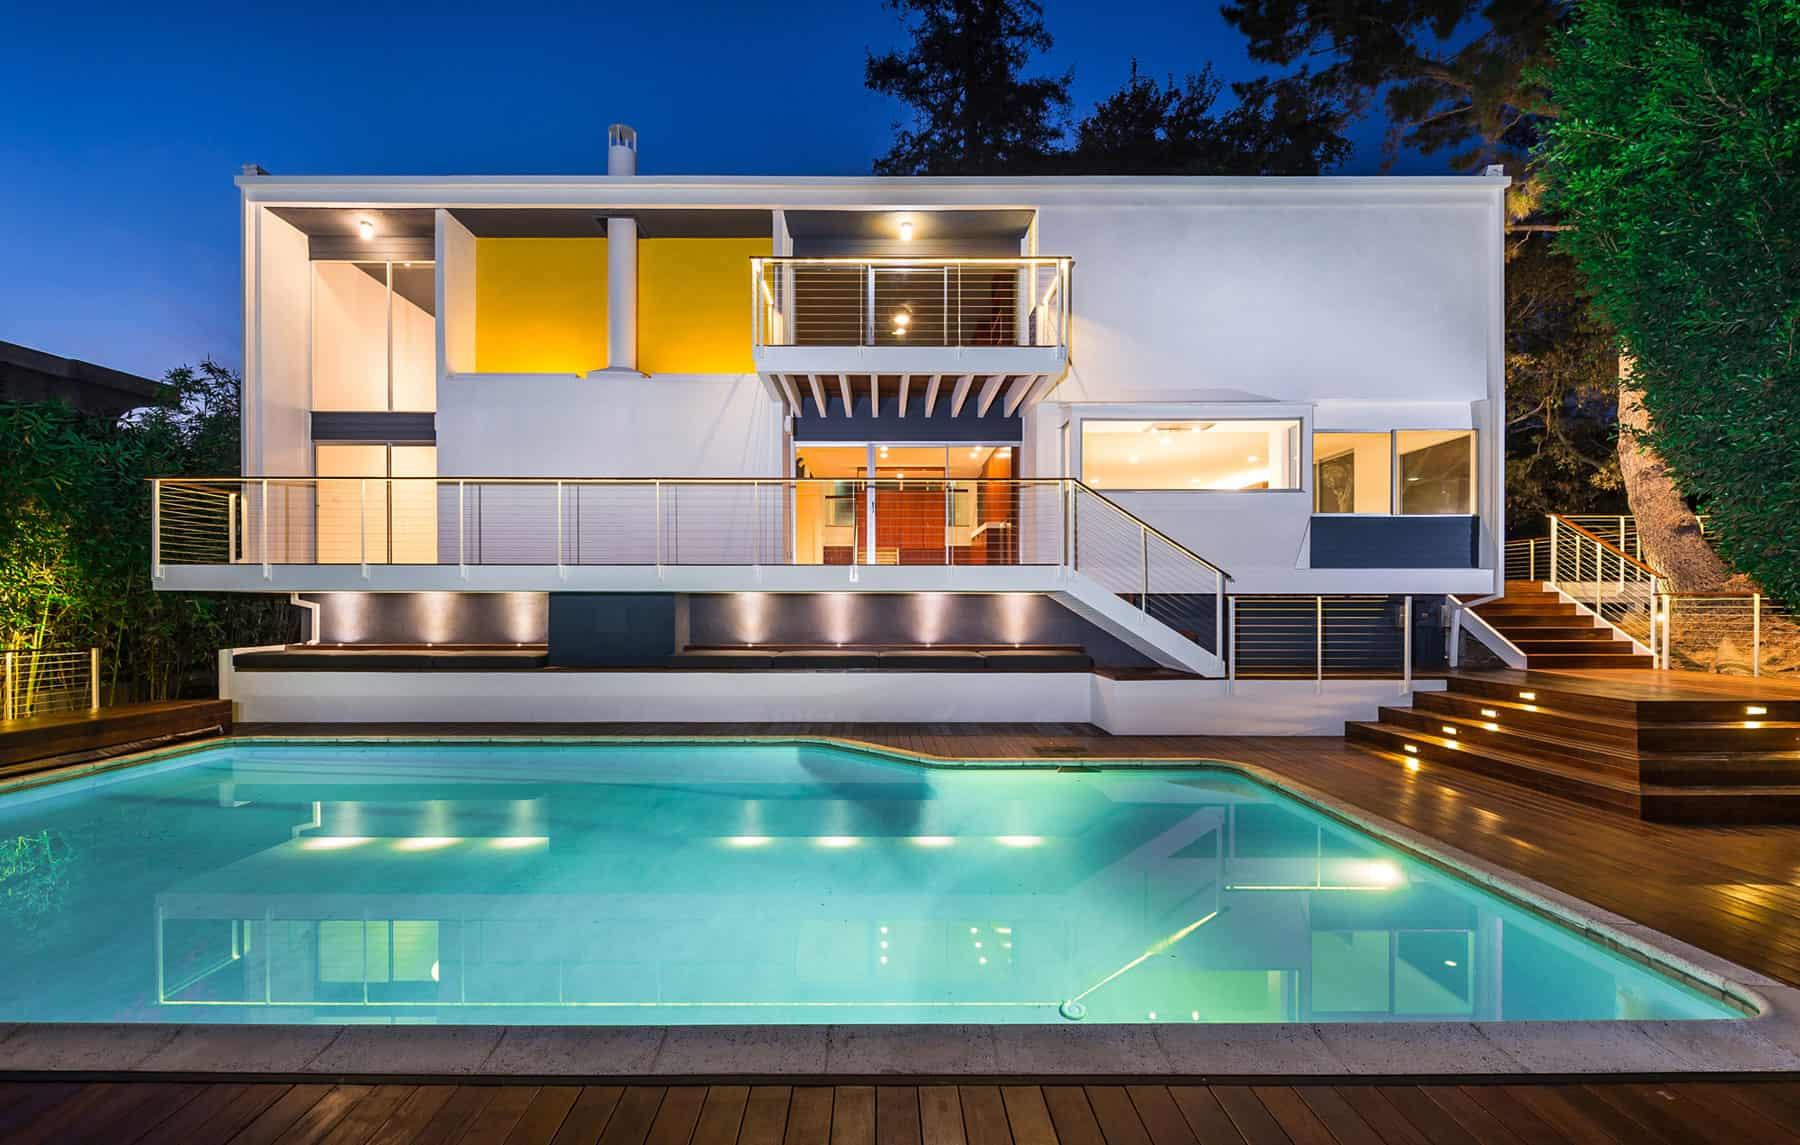 Kearsarge Residence by Kurt Krueger Architect